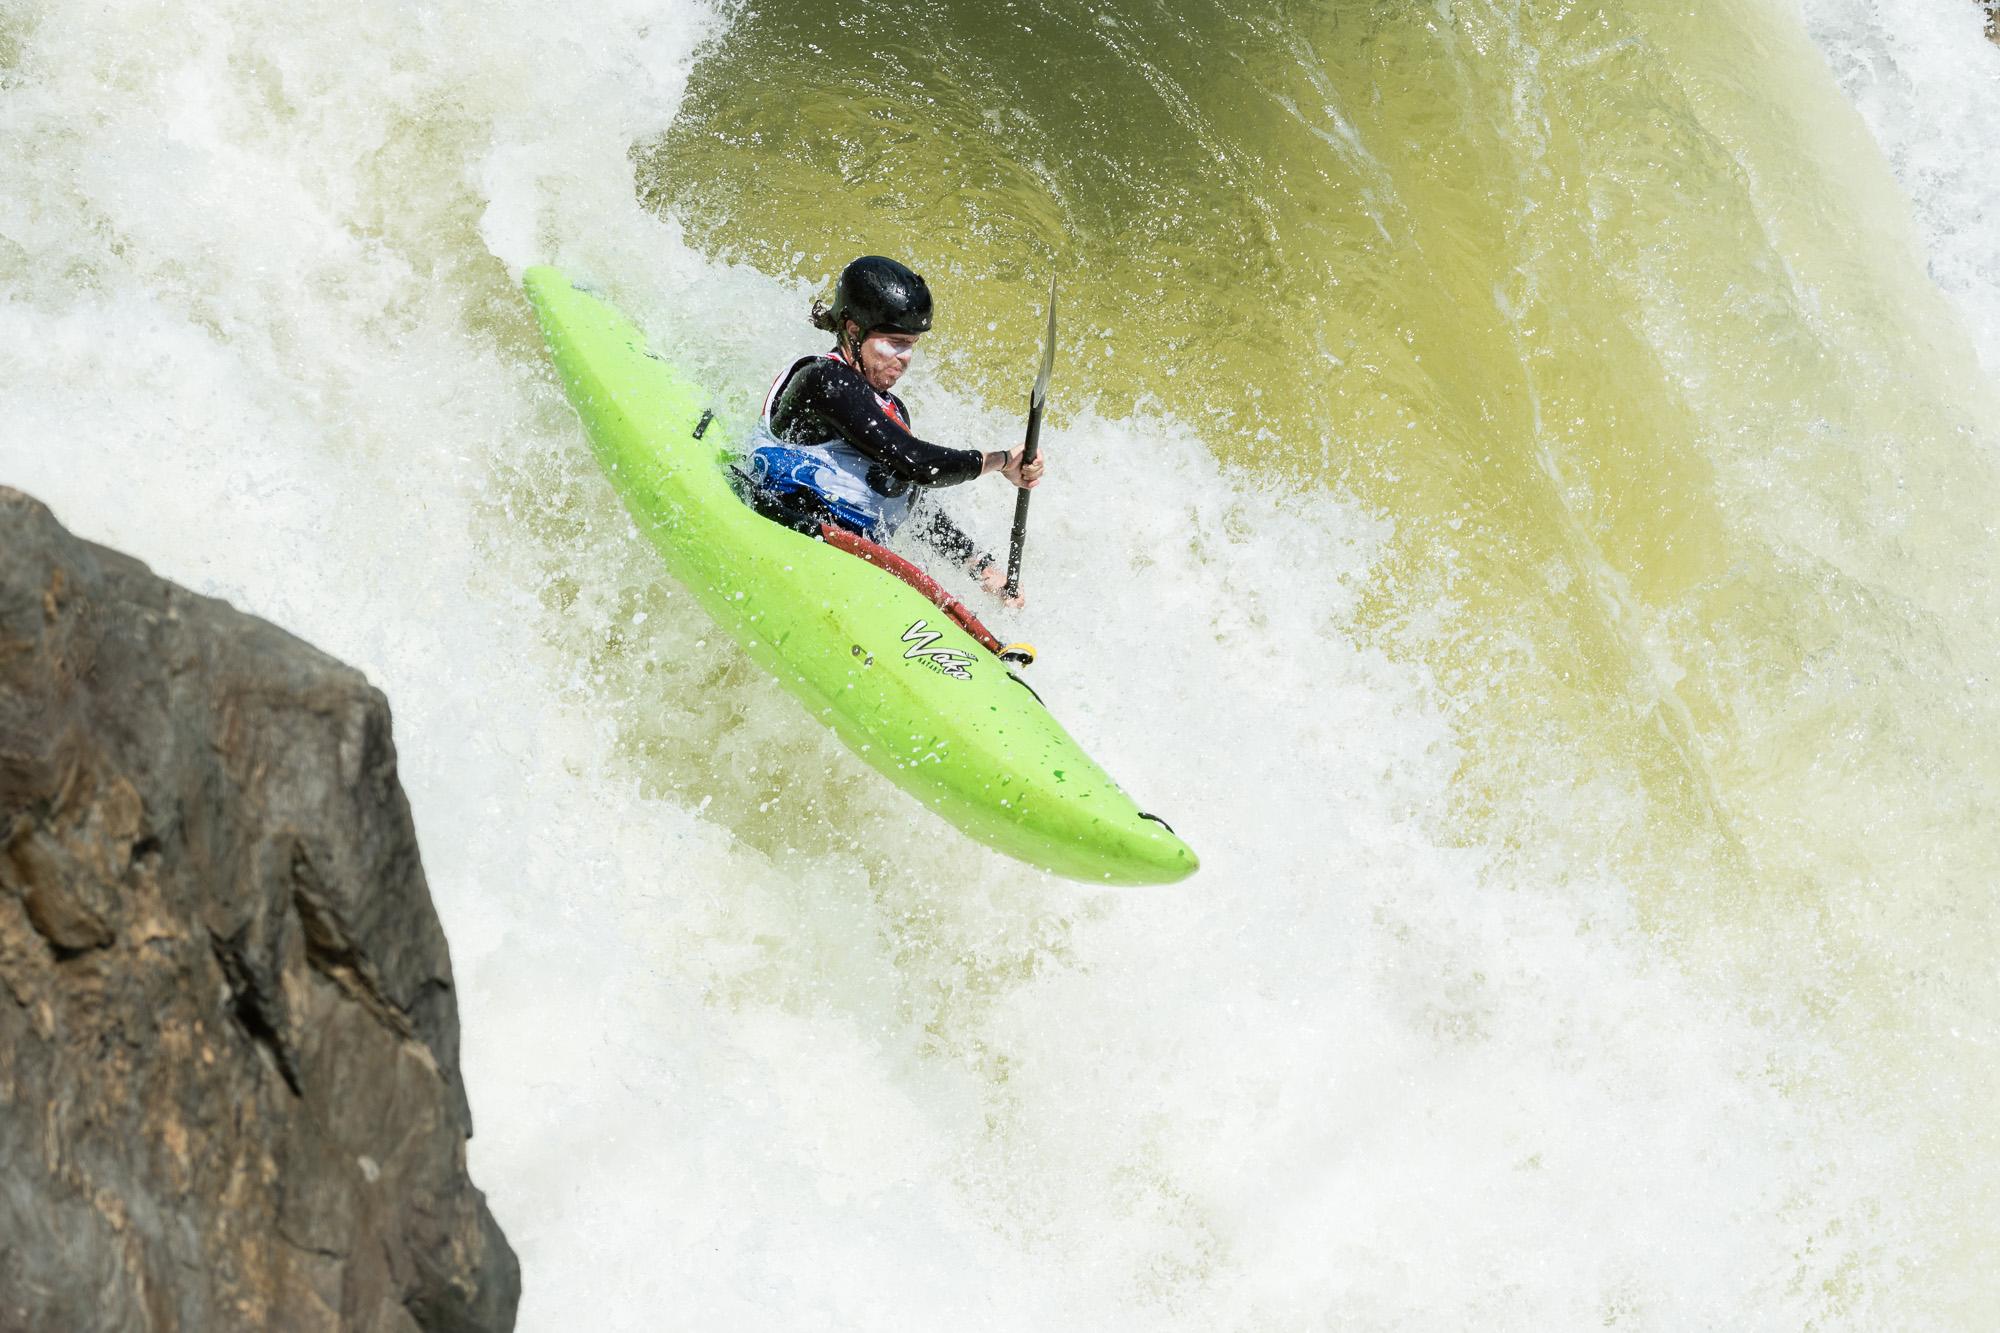 Rhys Jensen-Jones Kayaking The Spout at Great Falls